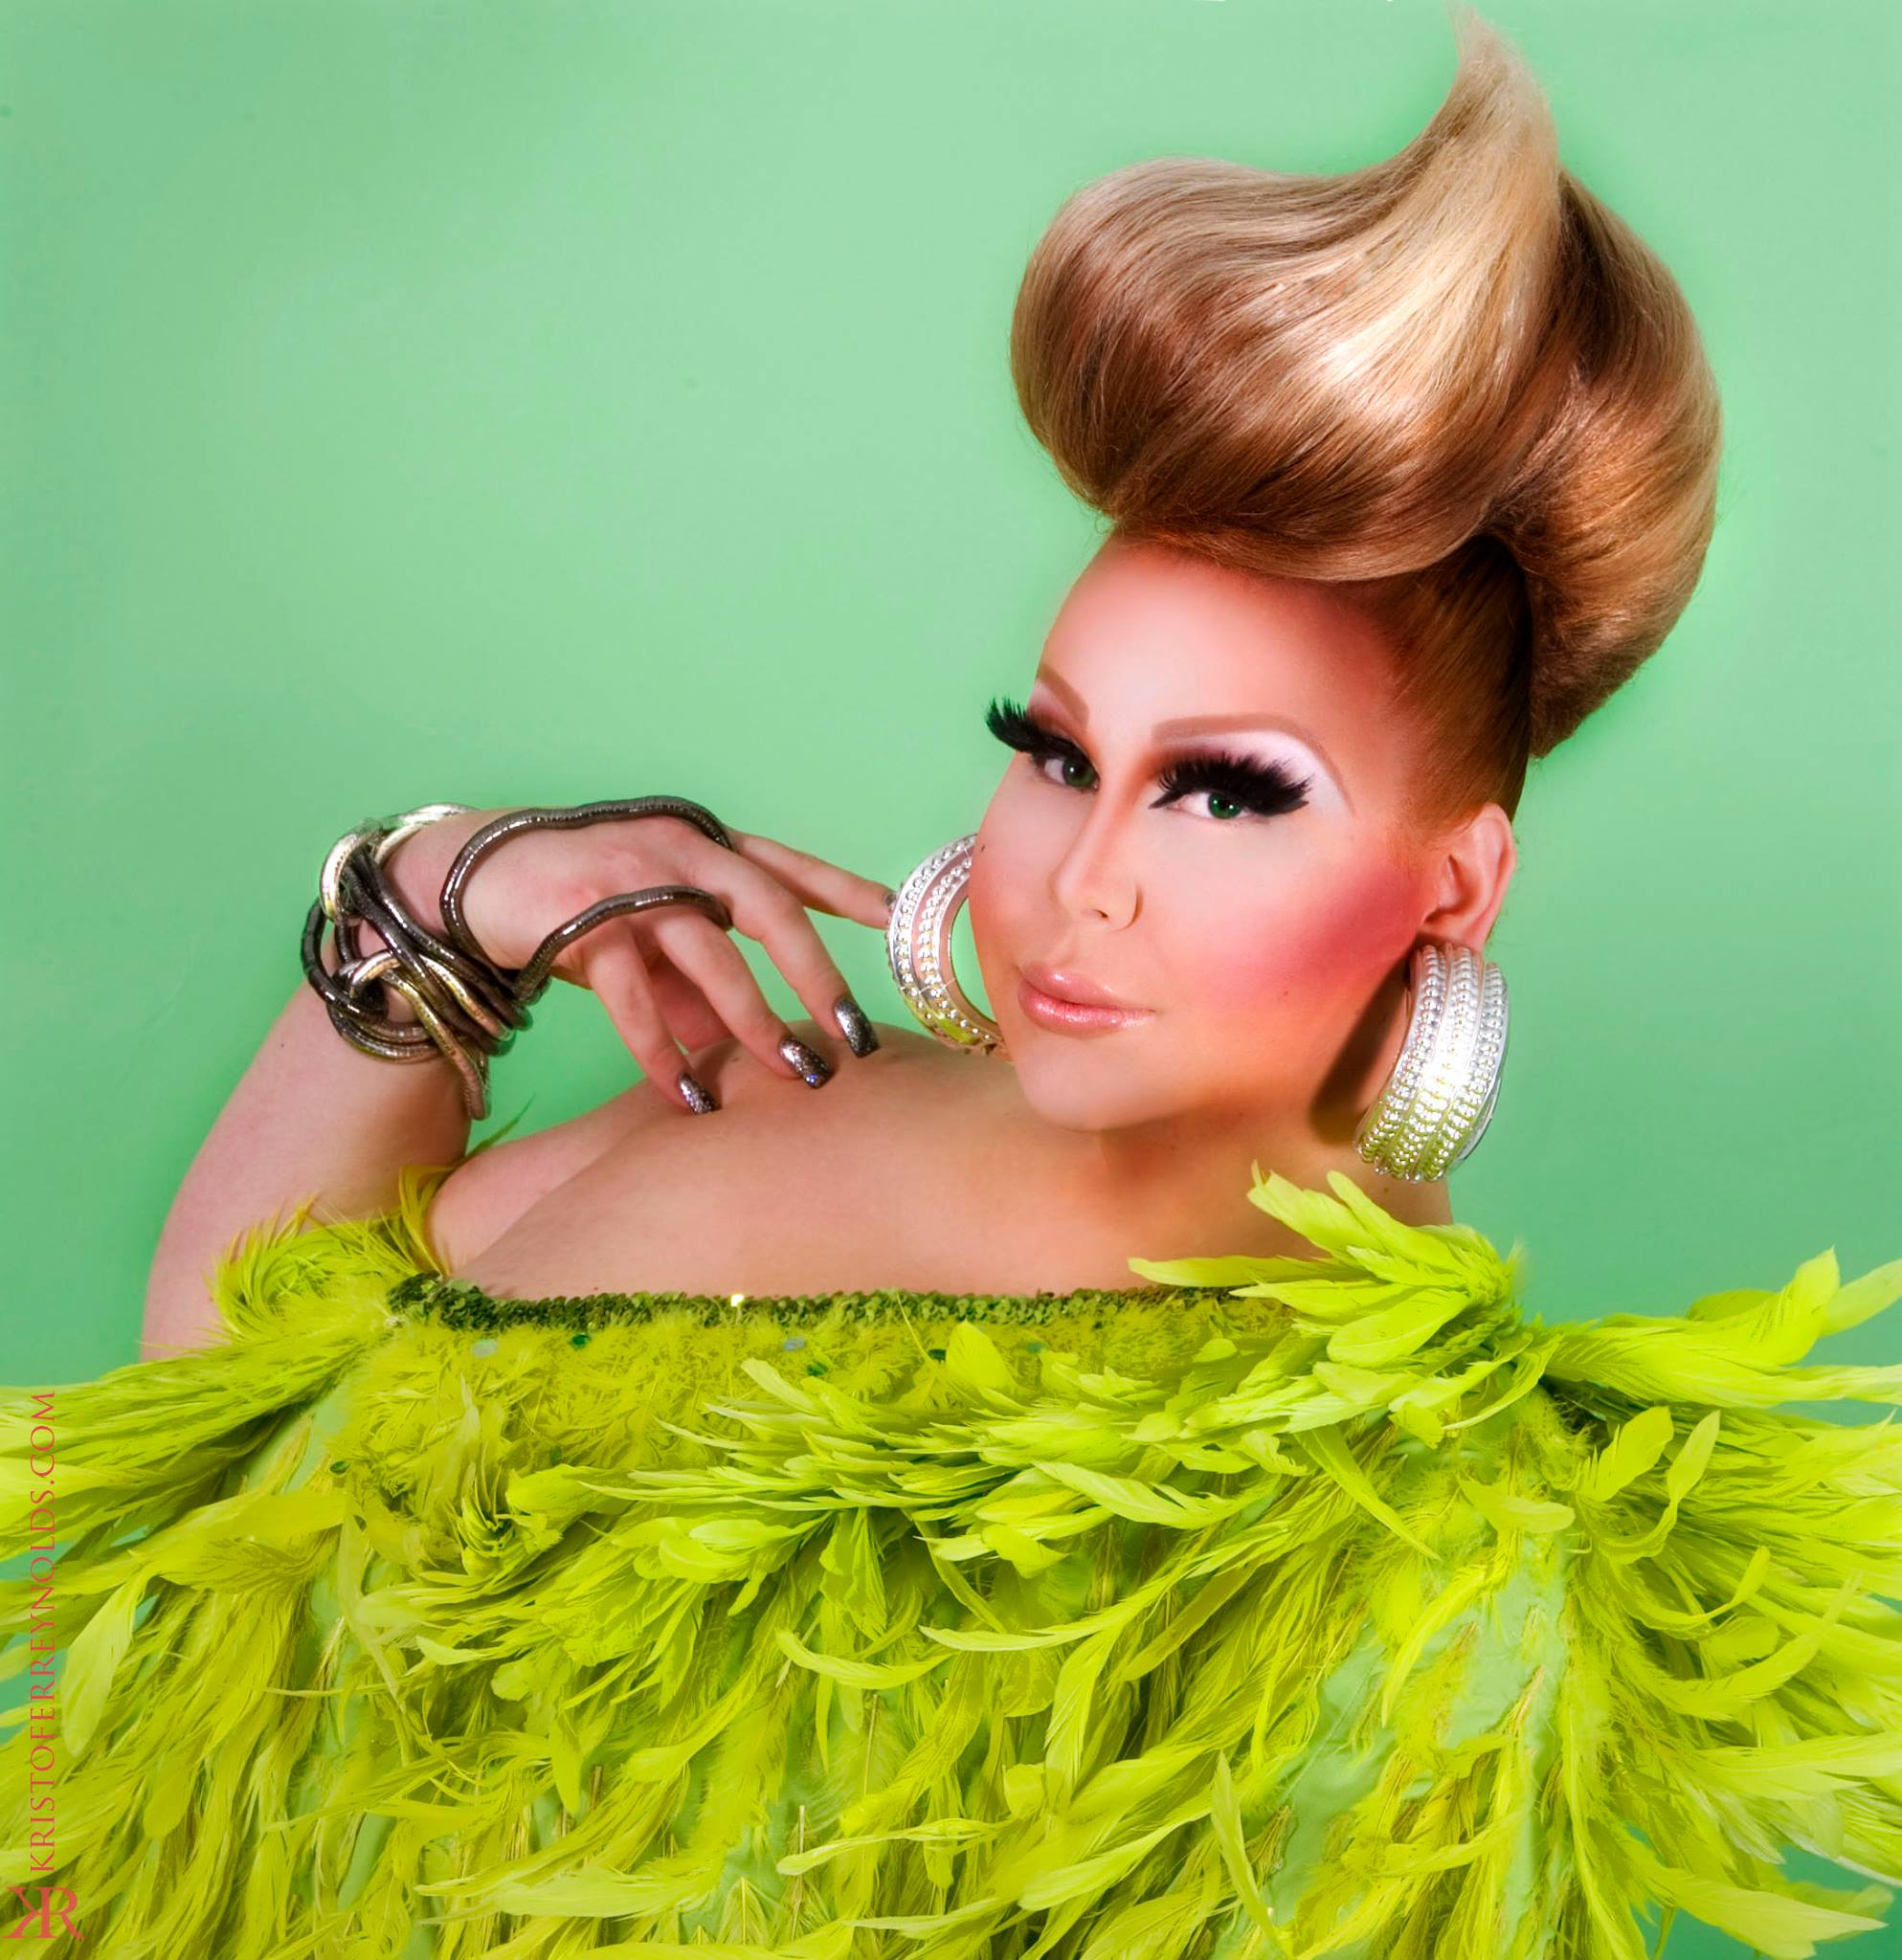 Coco Markstone - Photo by Kristofer Reynolds